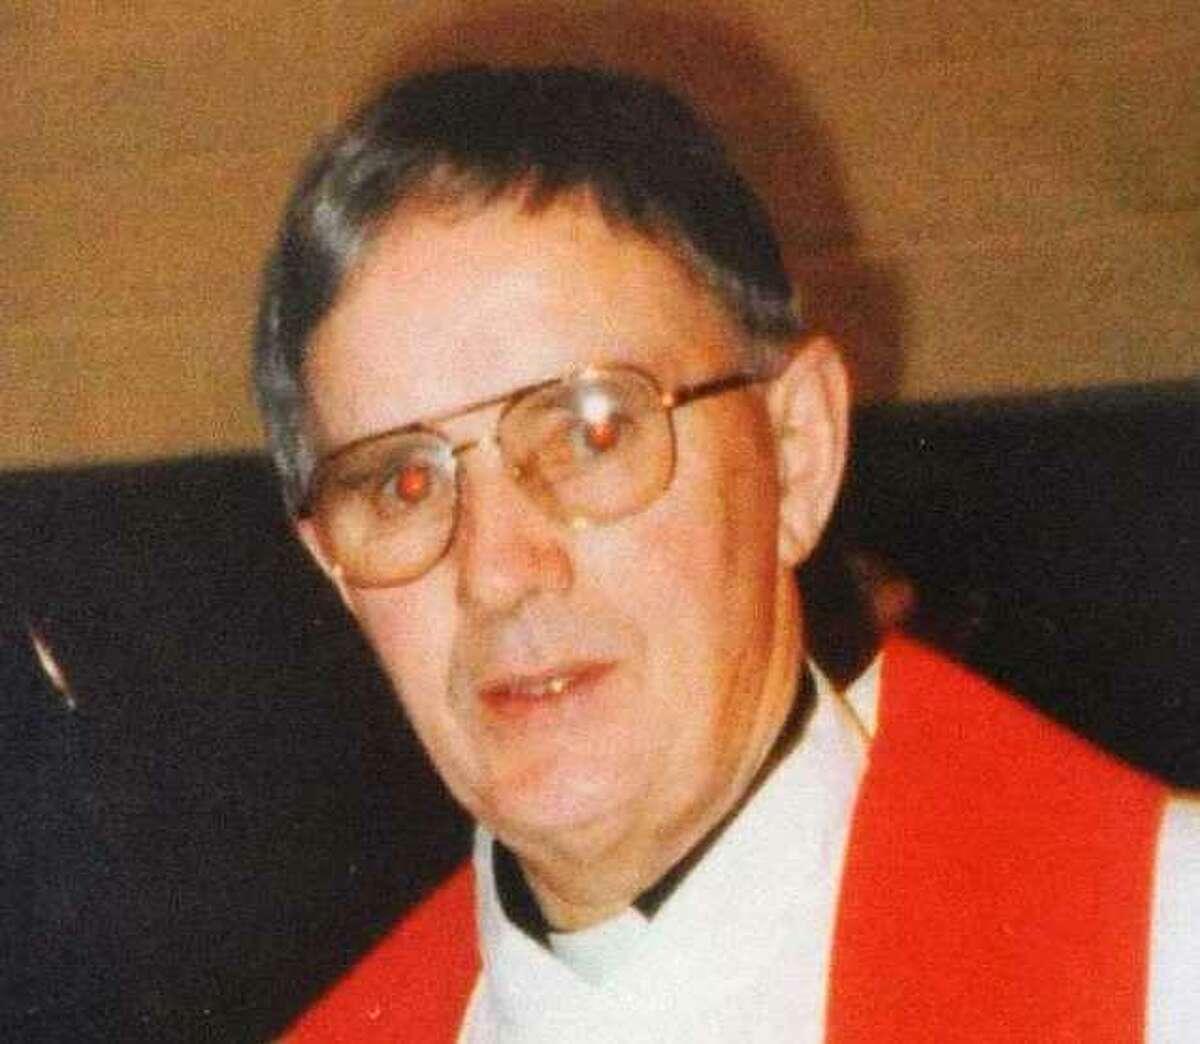 Undated photo of Rev. Jeremiah Nunan. (Provided photo)